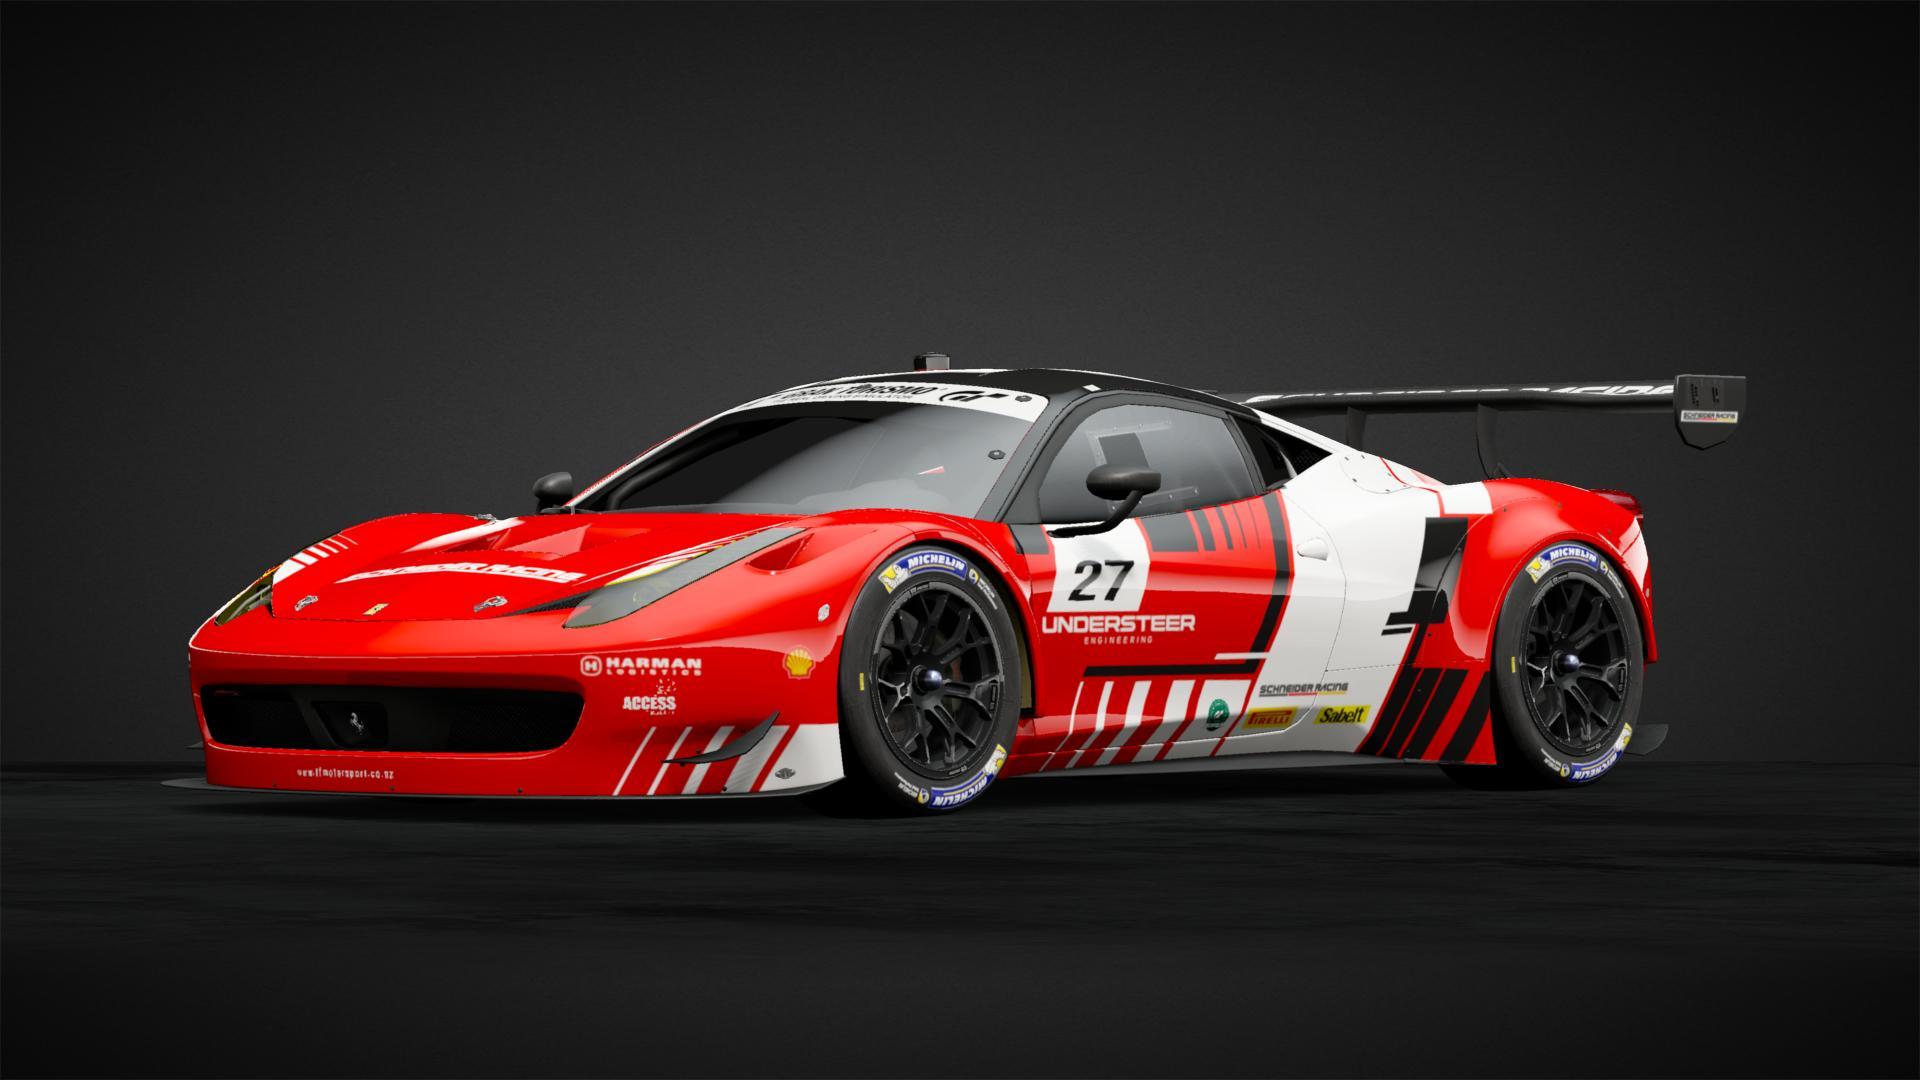 ferrari italia racing livery , Car Livery by GTAdrive